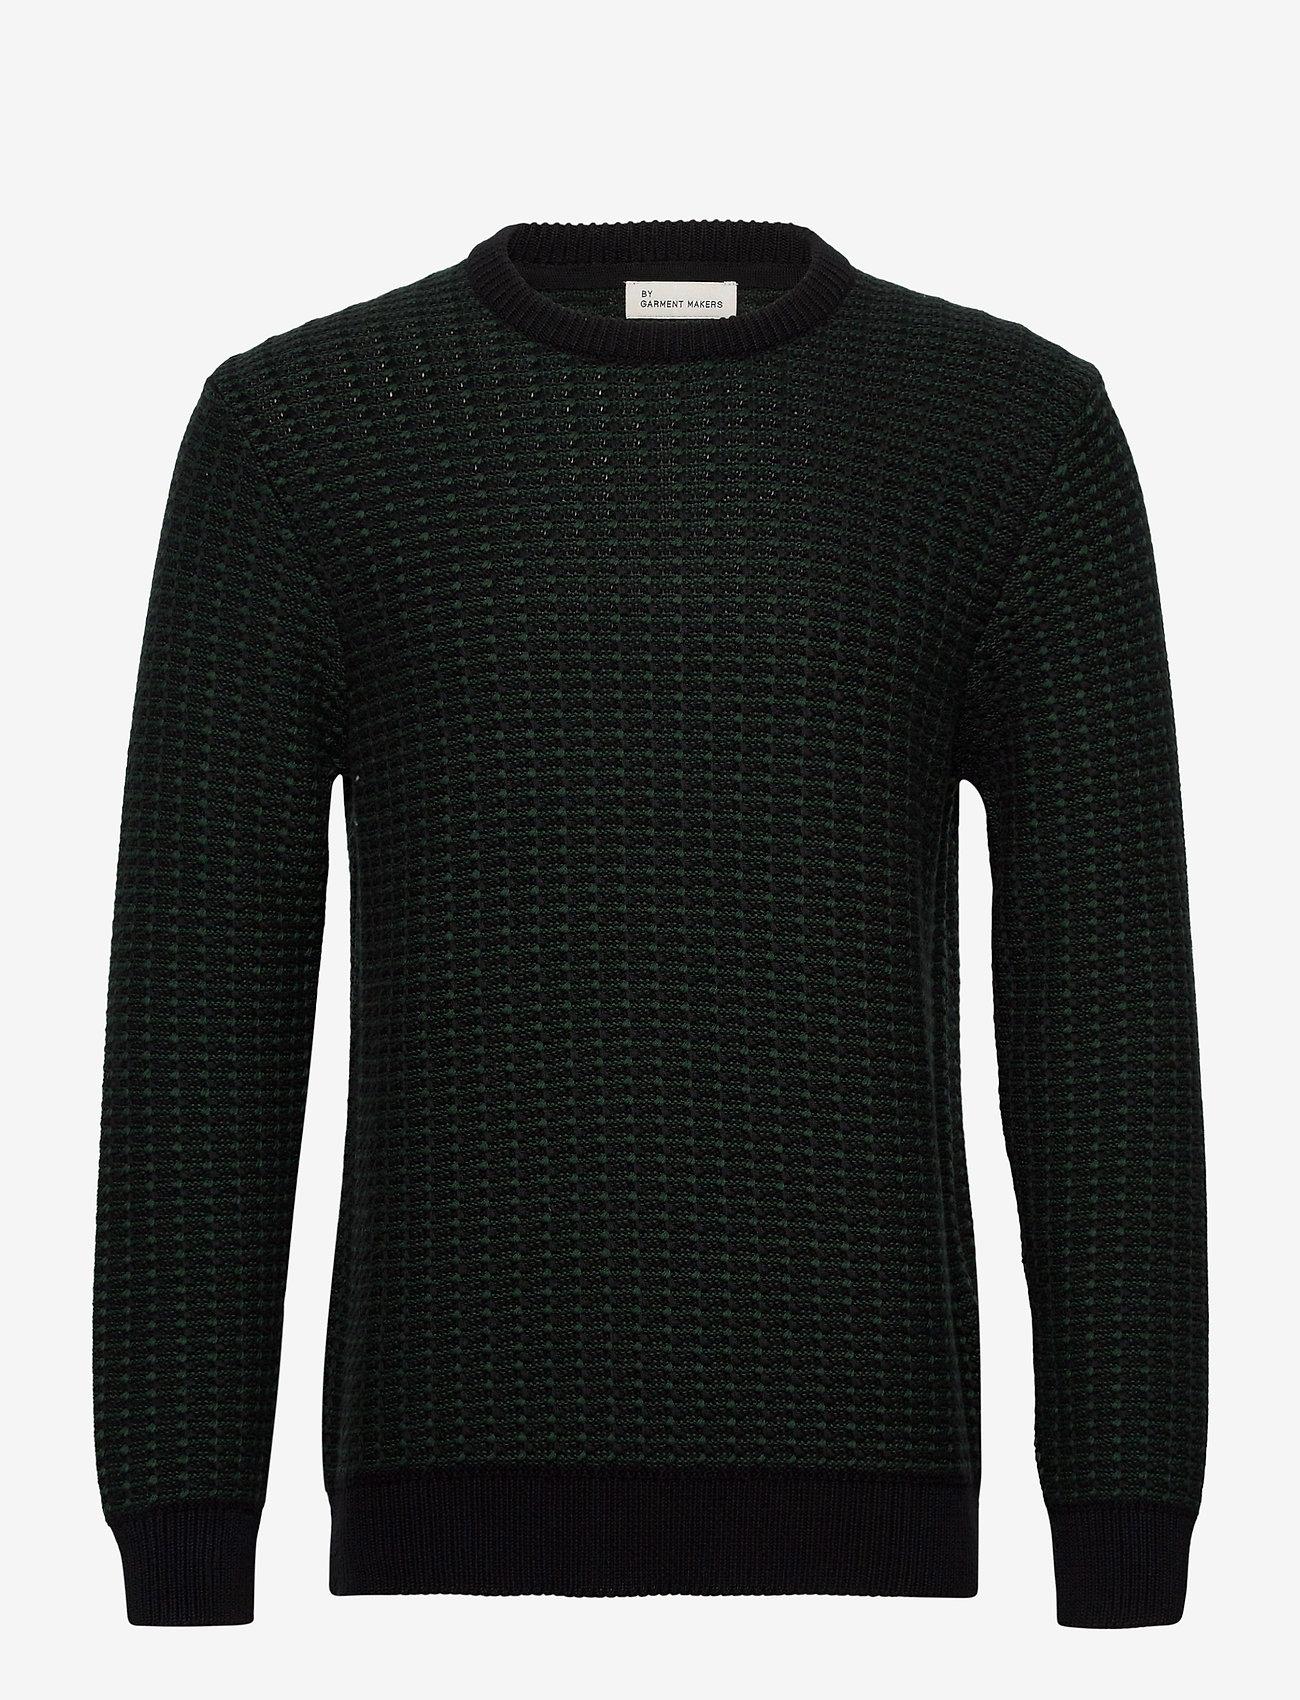 Leo (Pine Grove) (499 kr) - By Garment Makers oq46dilw